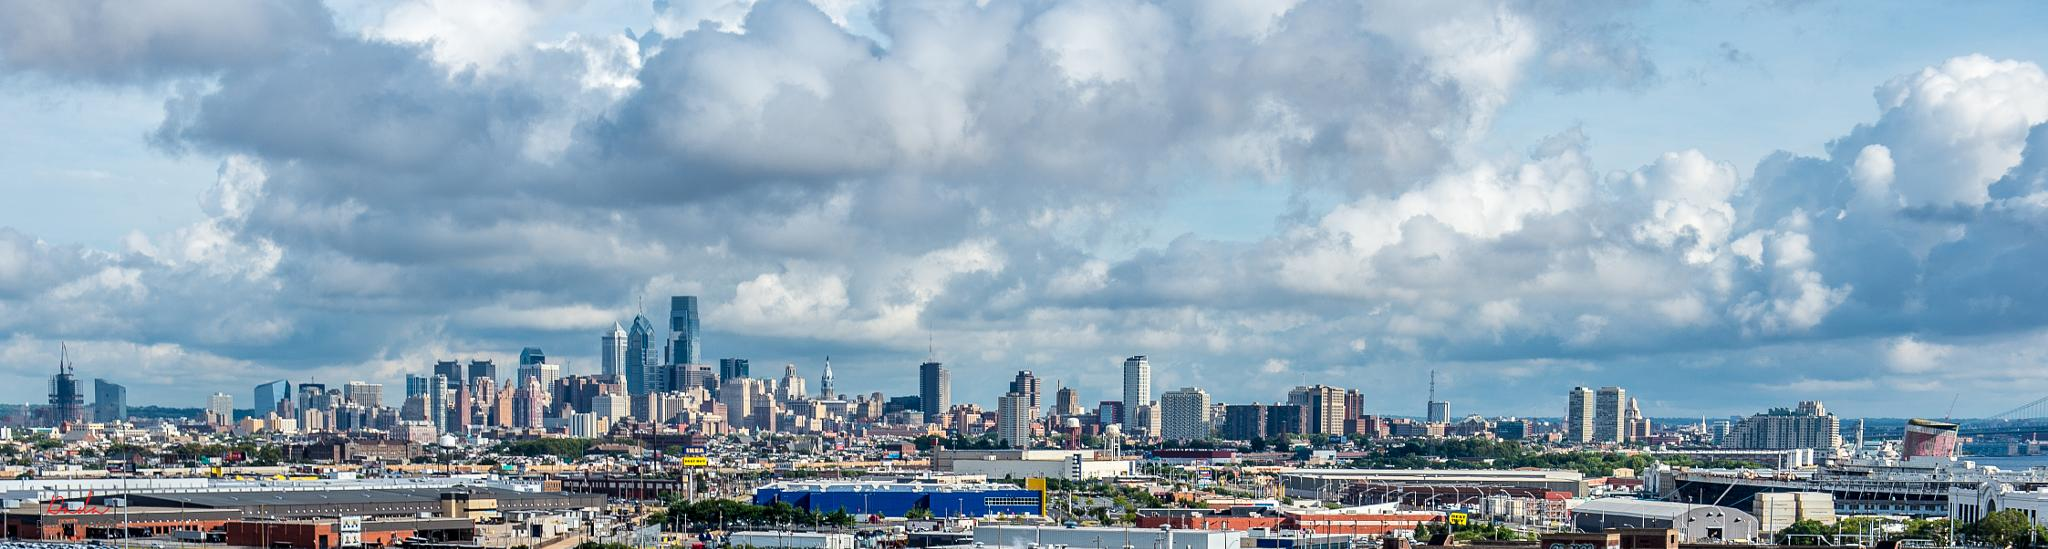 Philadelphia, Pennsylvania's largest city by Danny Pham